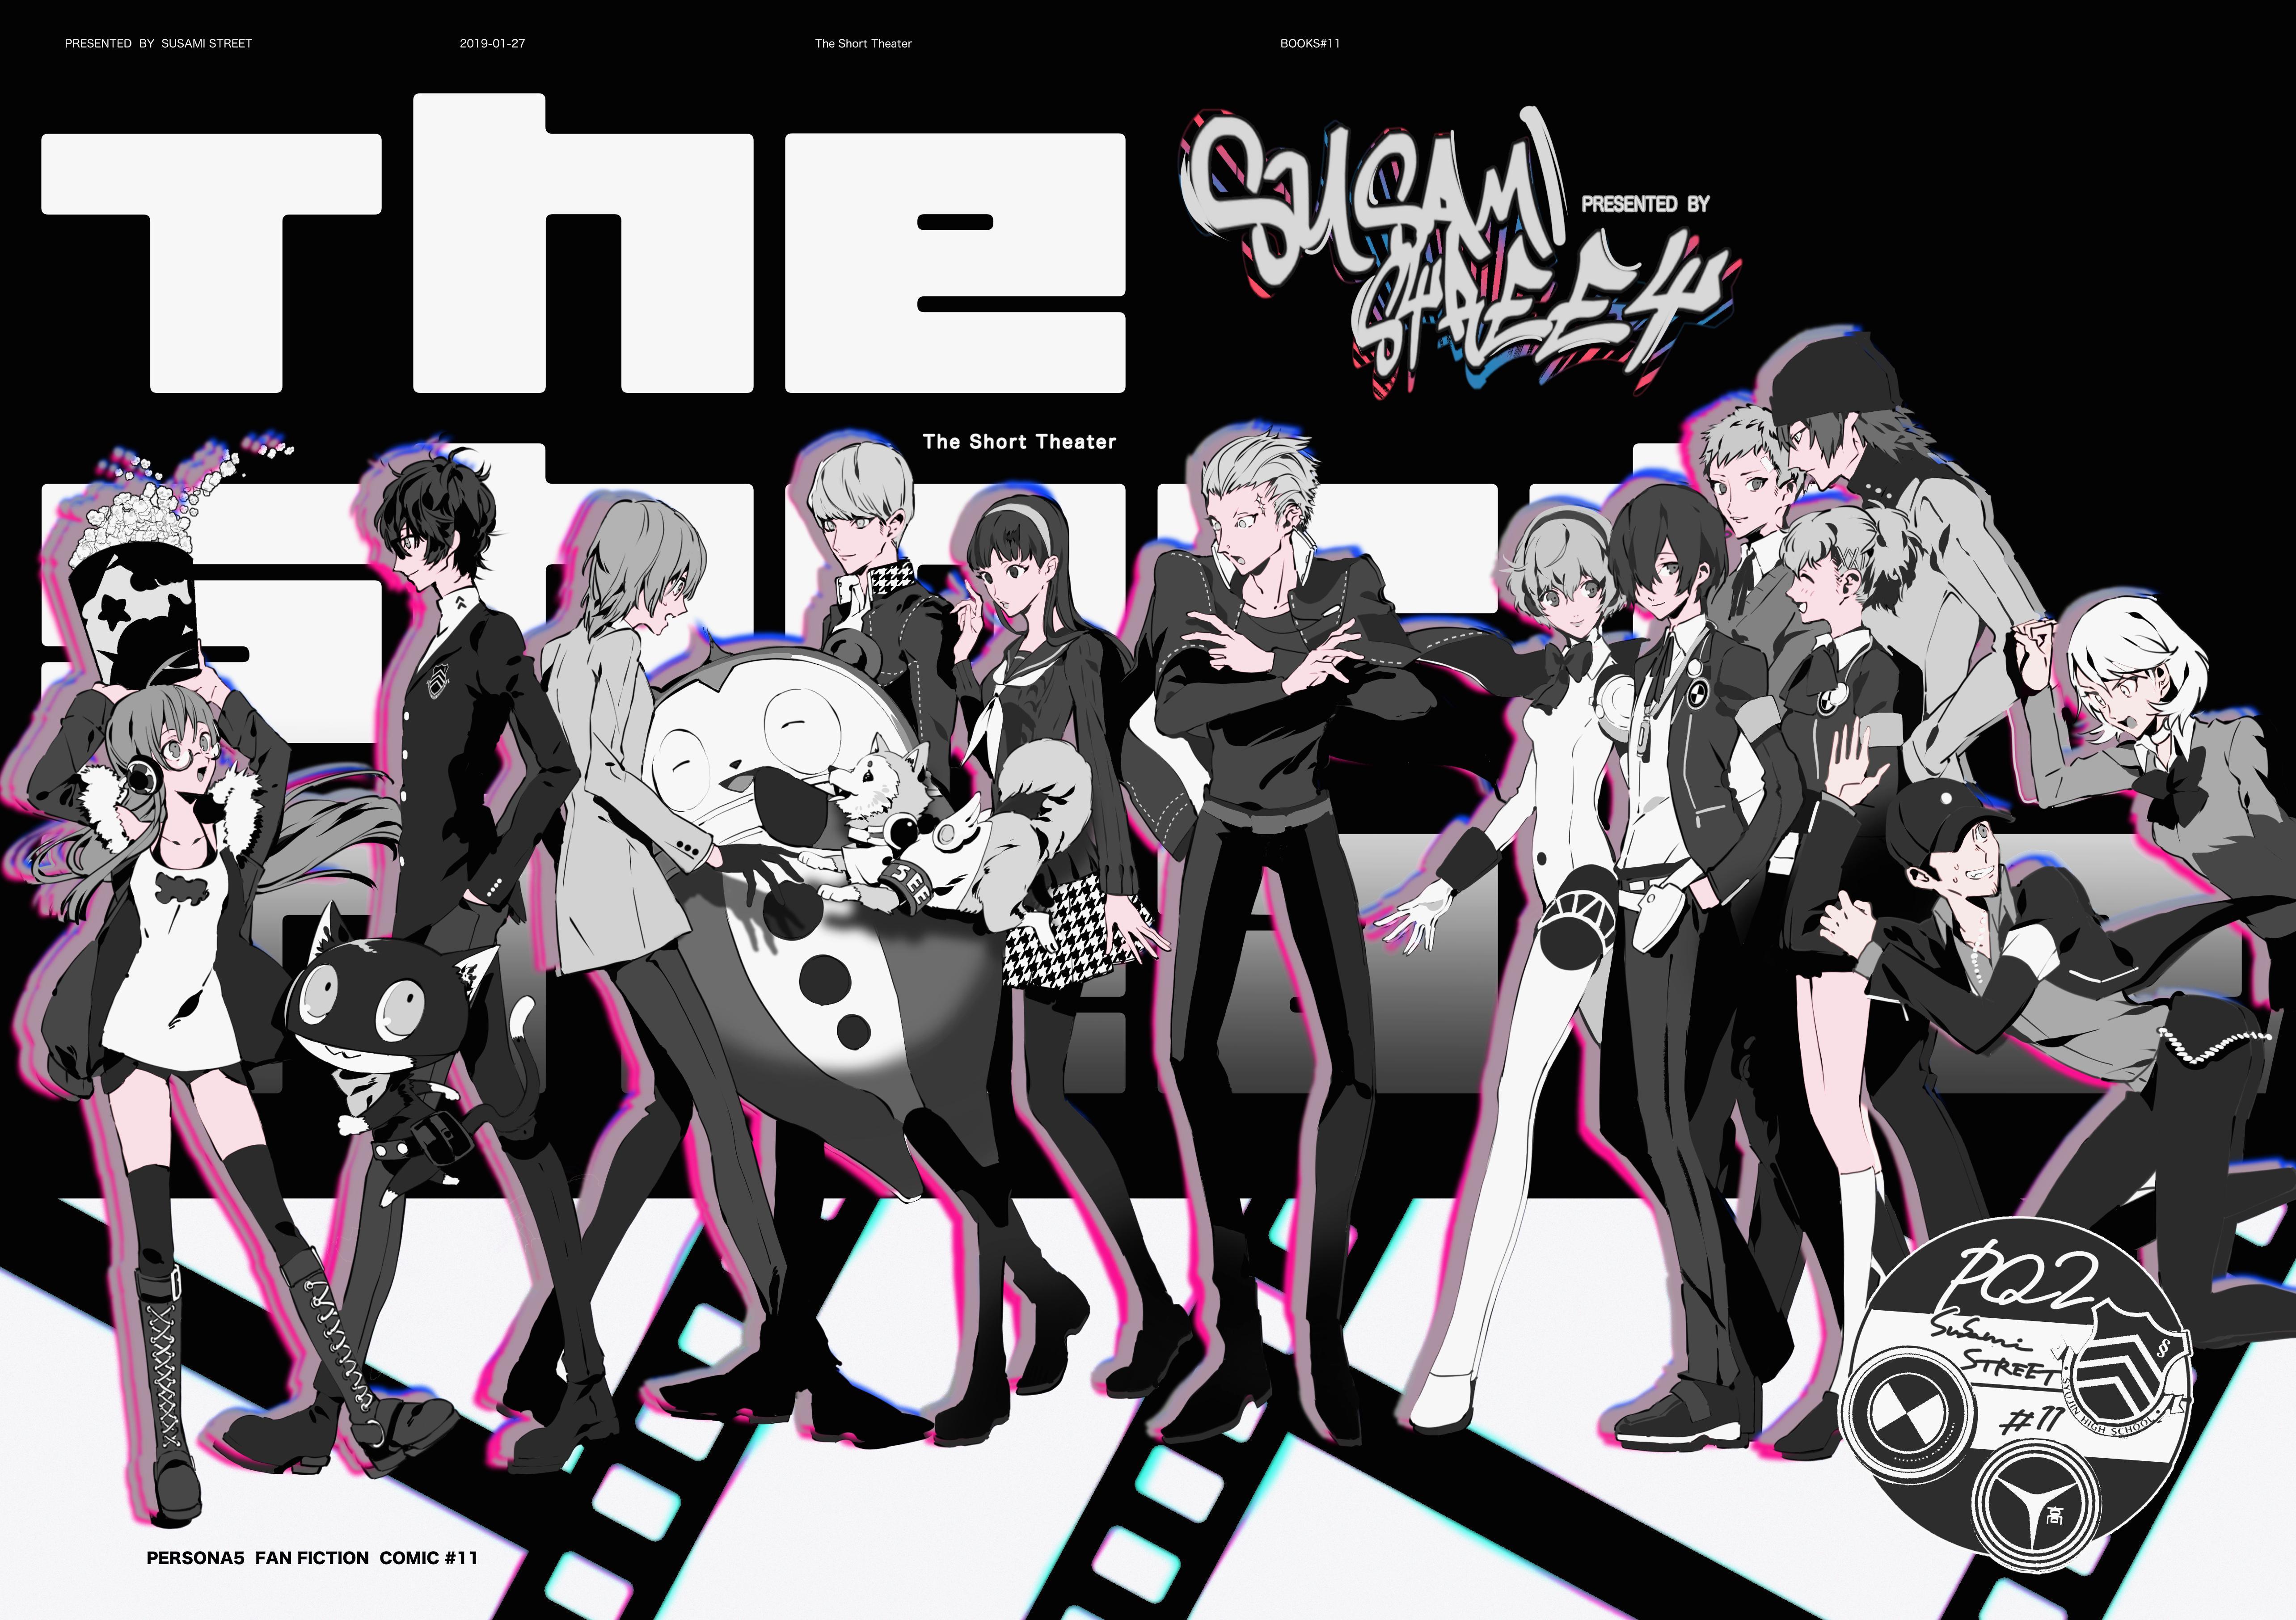 Persona Q2: New Cinema Labyrinth Image #2640596 - Zerochan